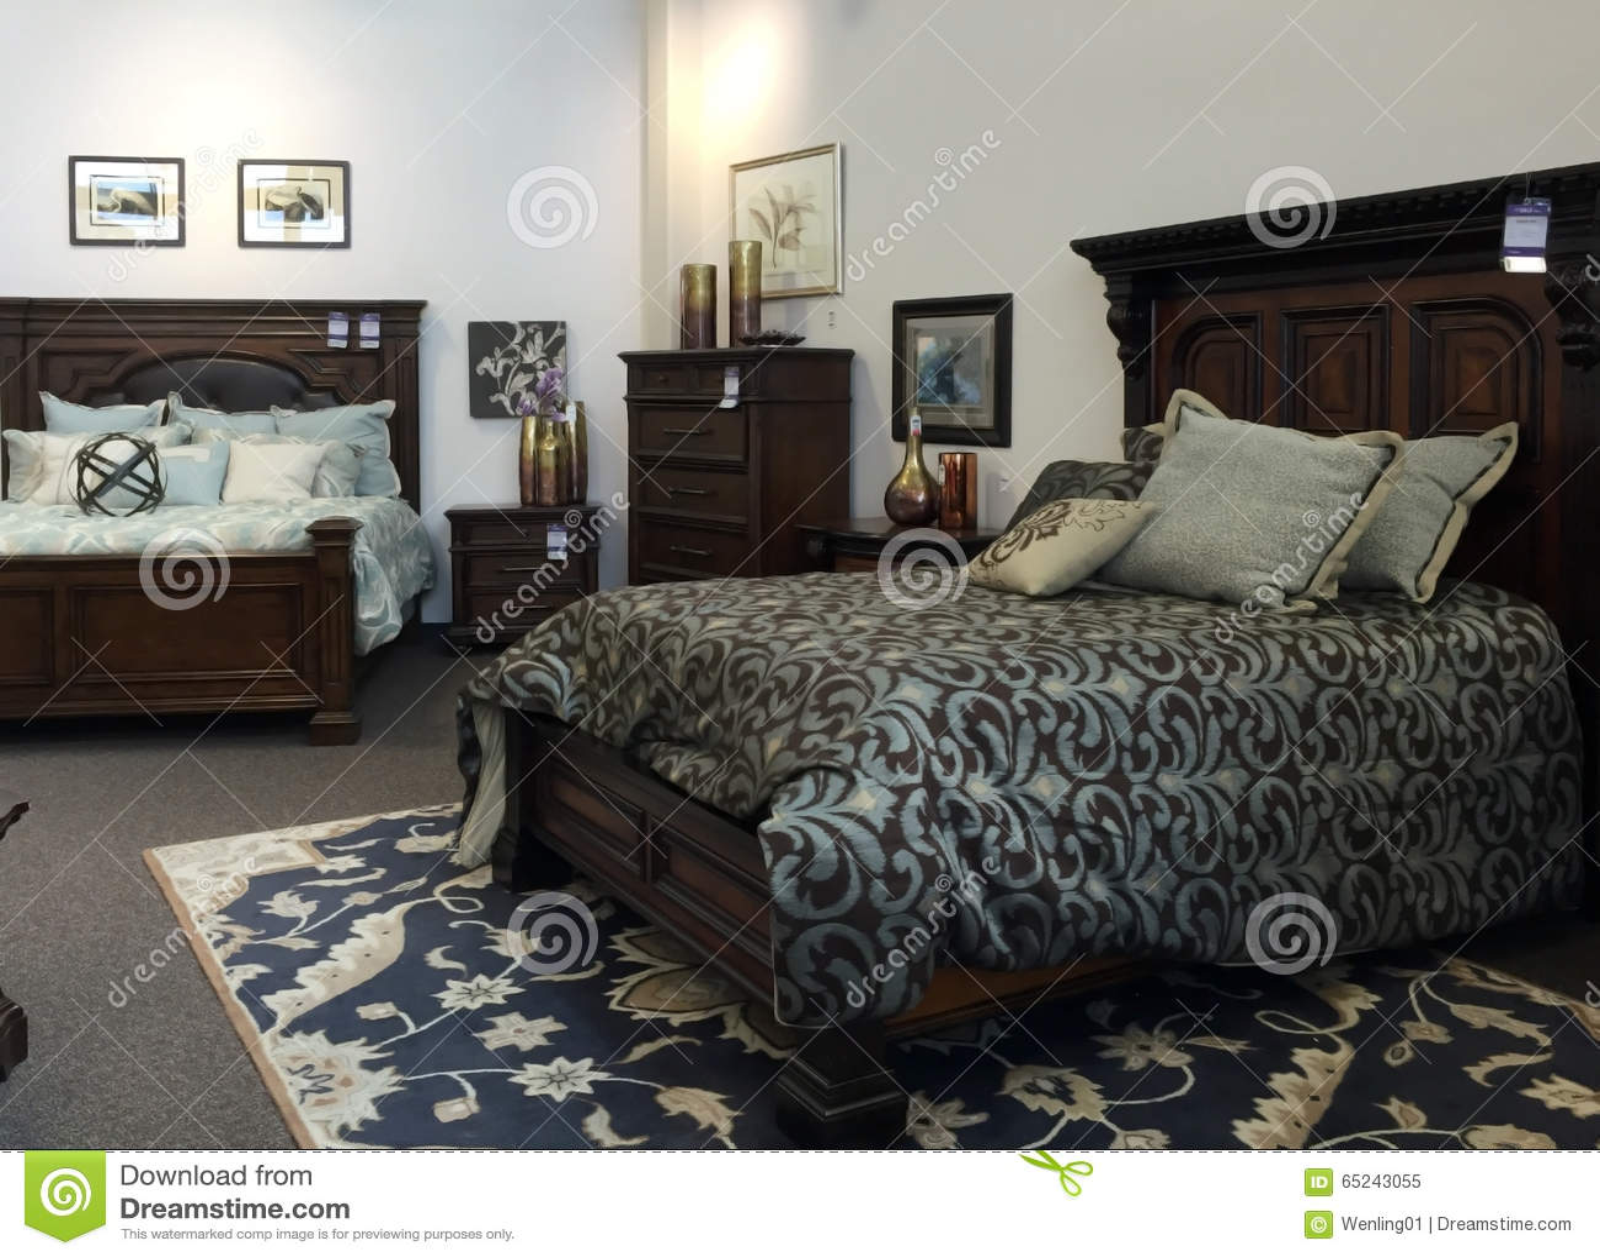 Selling Bedroom Furniture Bedroom Furniture Selling At Furniture Market Editorial Image